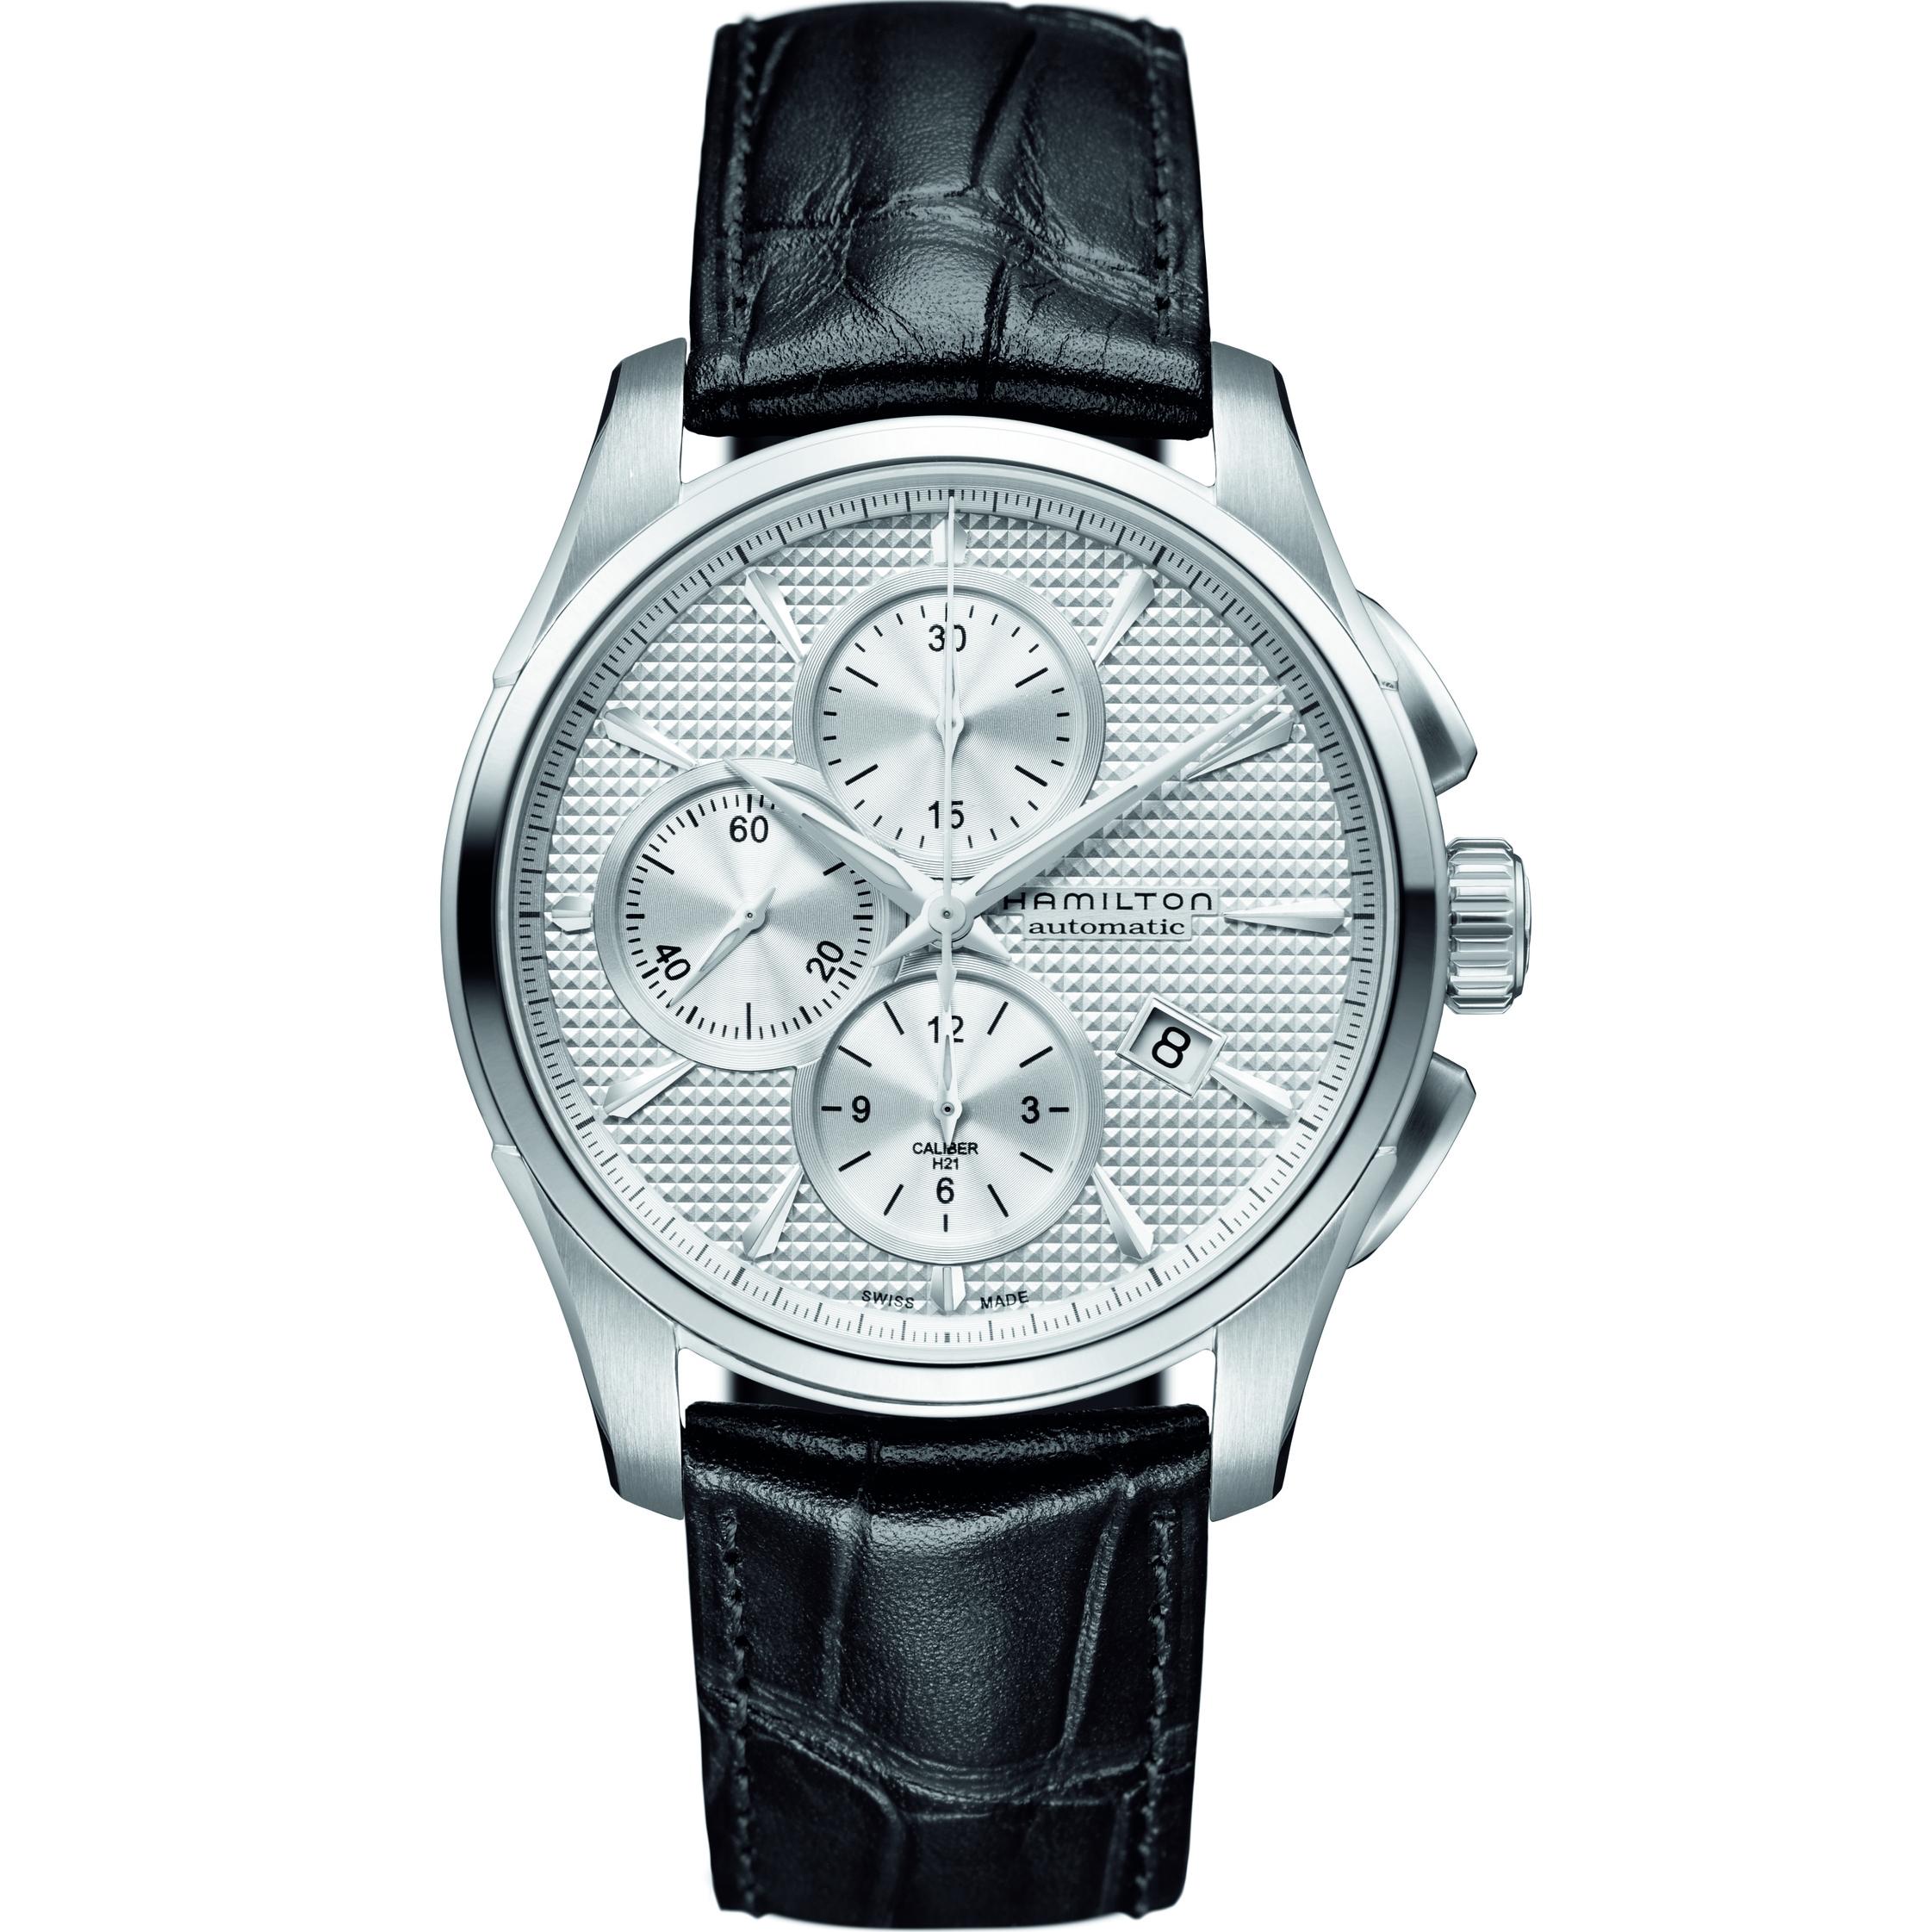 61a0d4bd3 Gents Hamilton Jazzmaster Chronograph Watch (H32596751)   WatchShop.com™